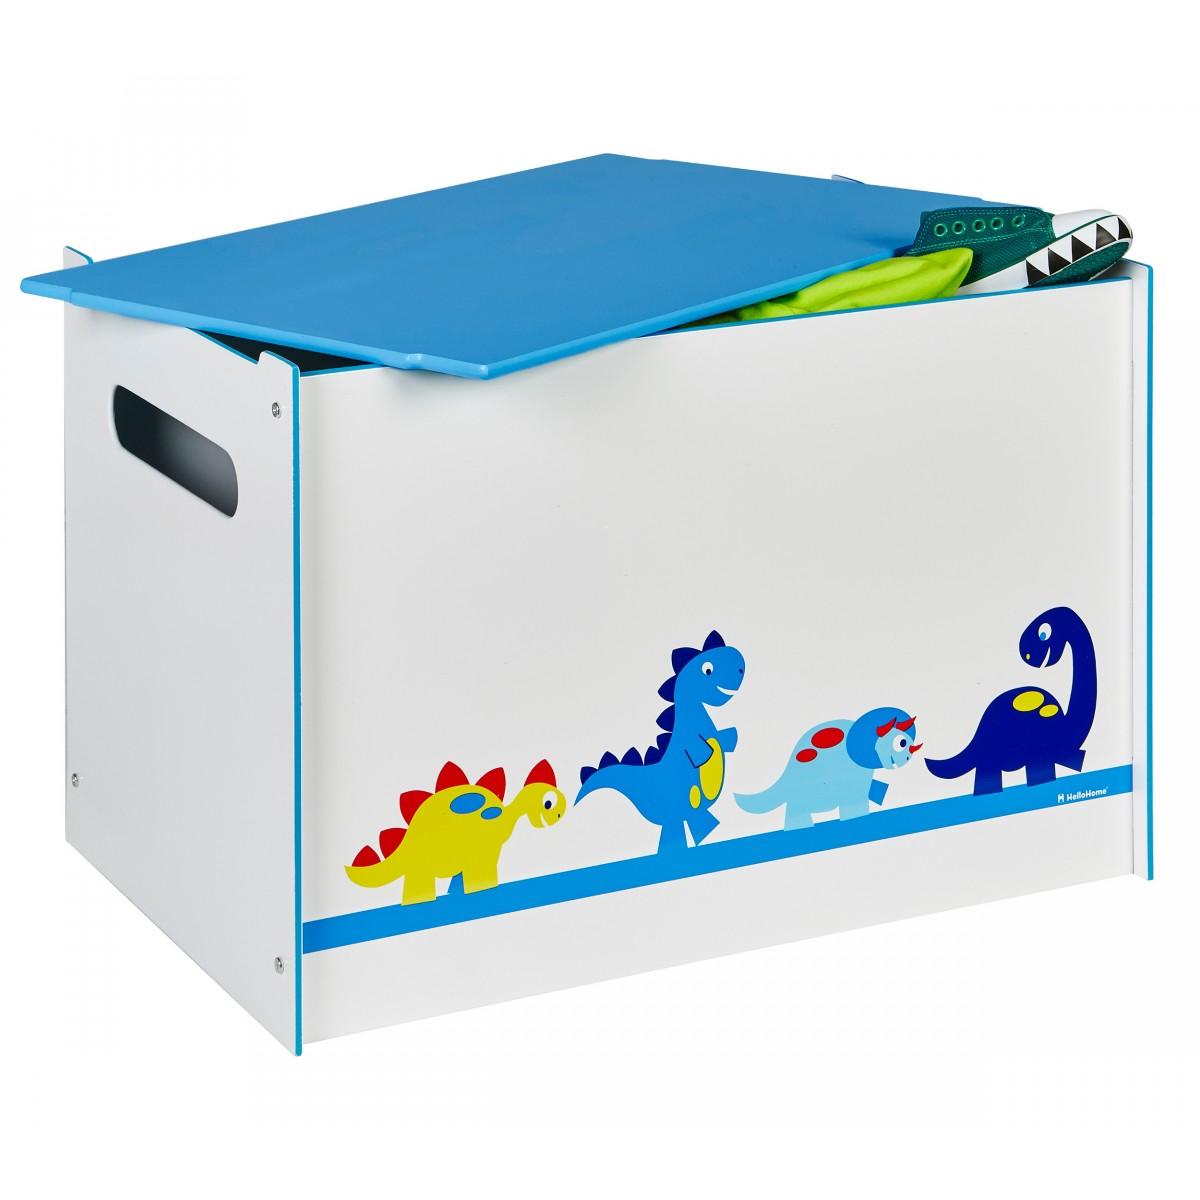 someo coffre de rangement dinosaures 60 x 40 x 40 cm. Black Bedroom Furniture Sets. Home Design Ideas